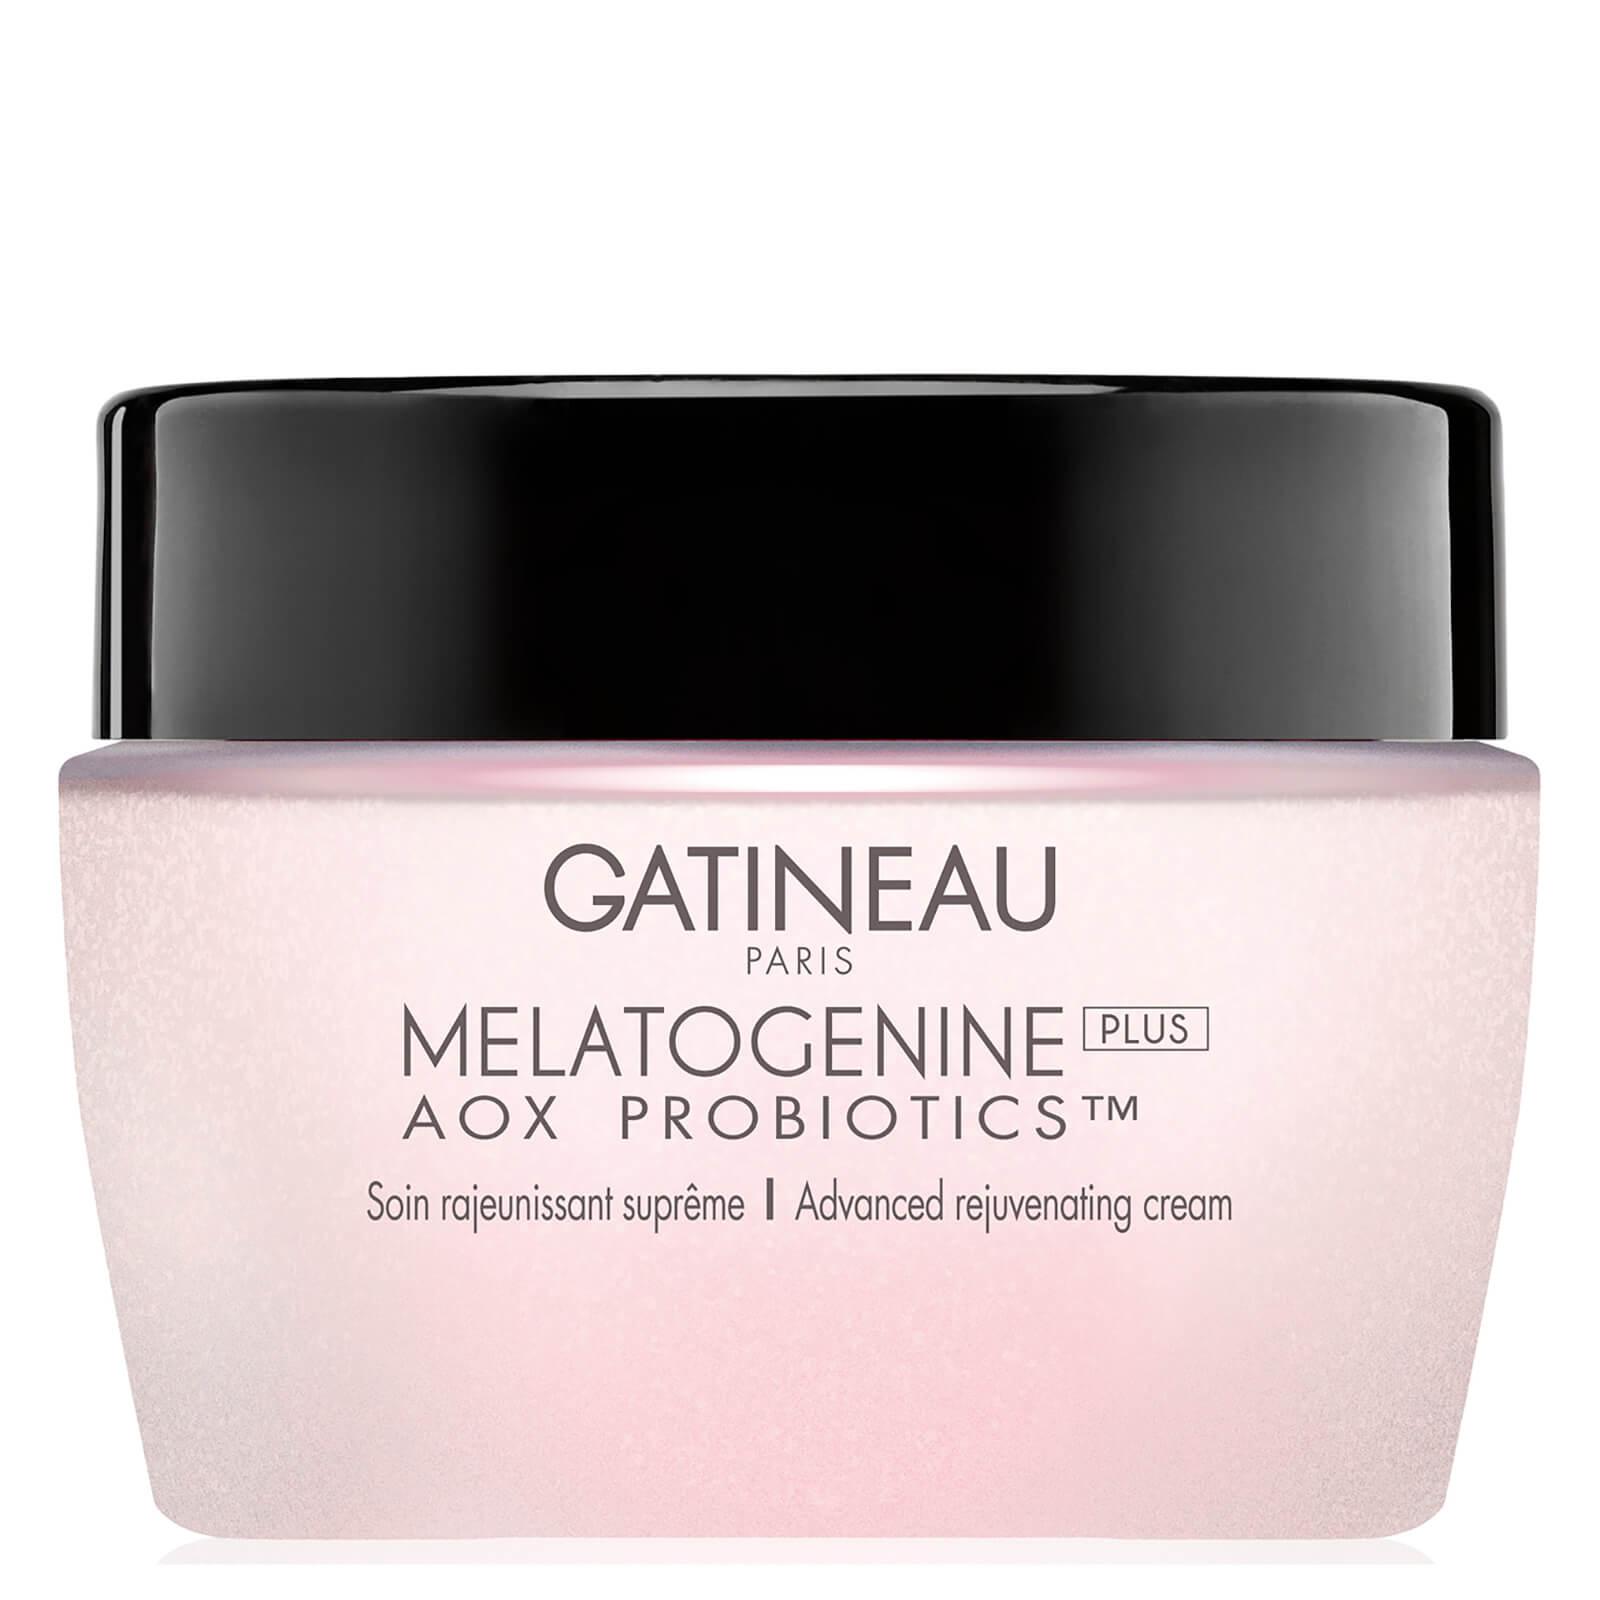 Gatineau Melatogenine Aox Probiotics Advanced Rejuvenating Cream 50ml